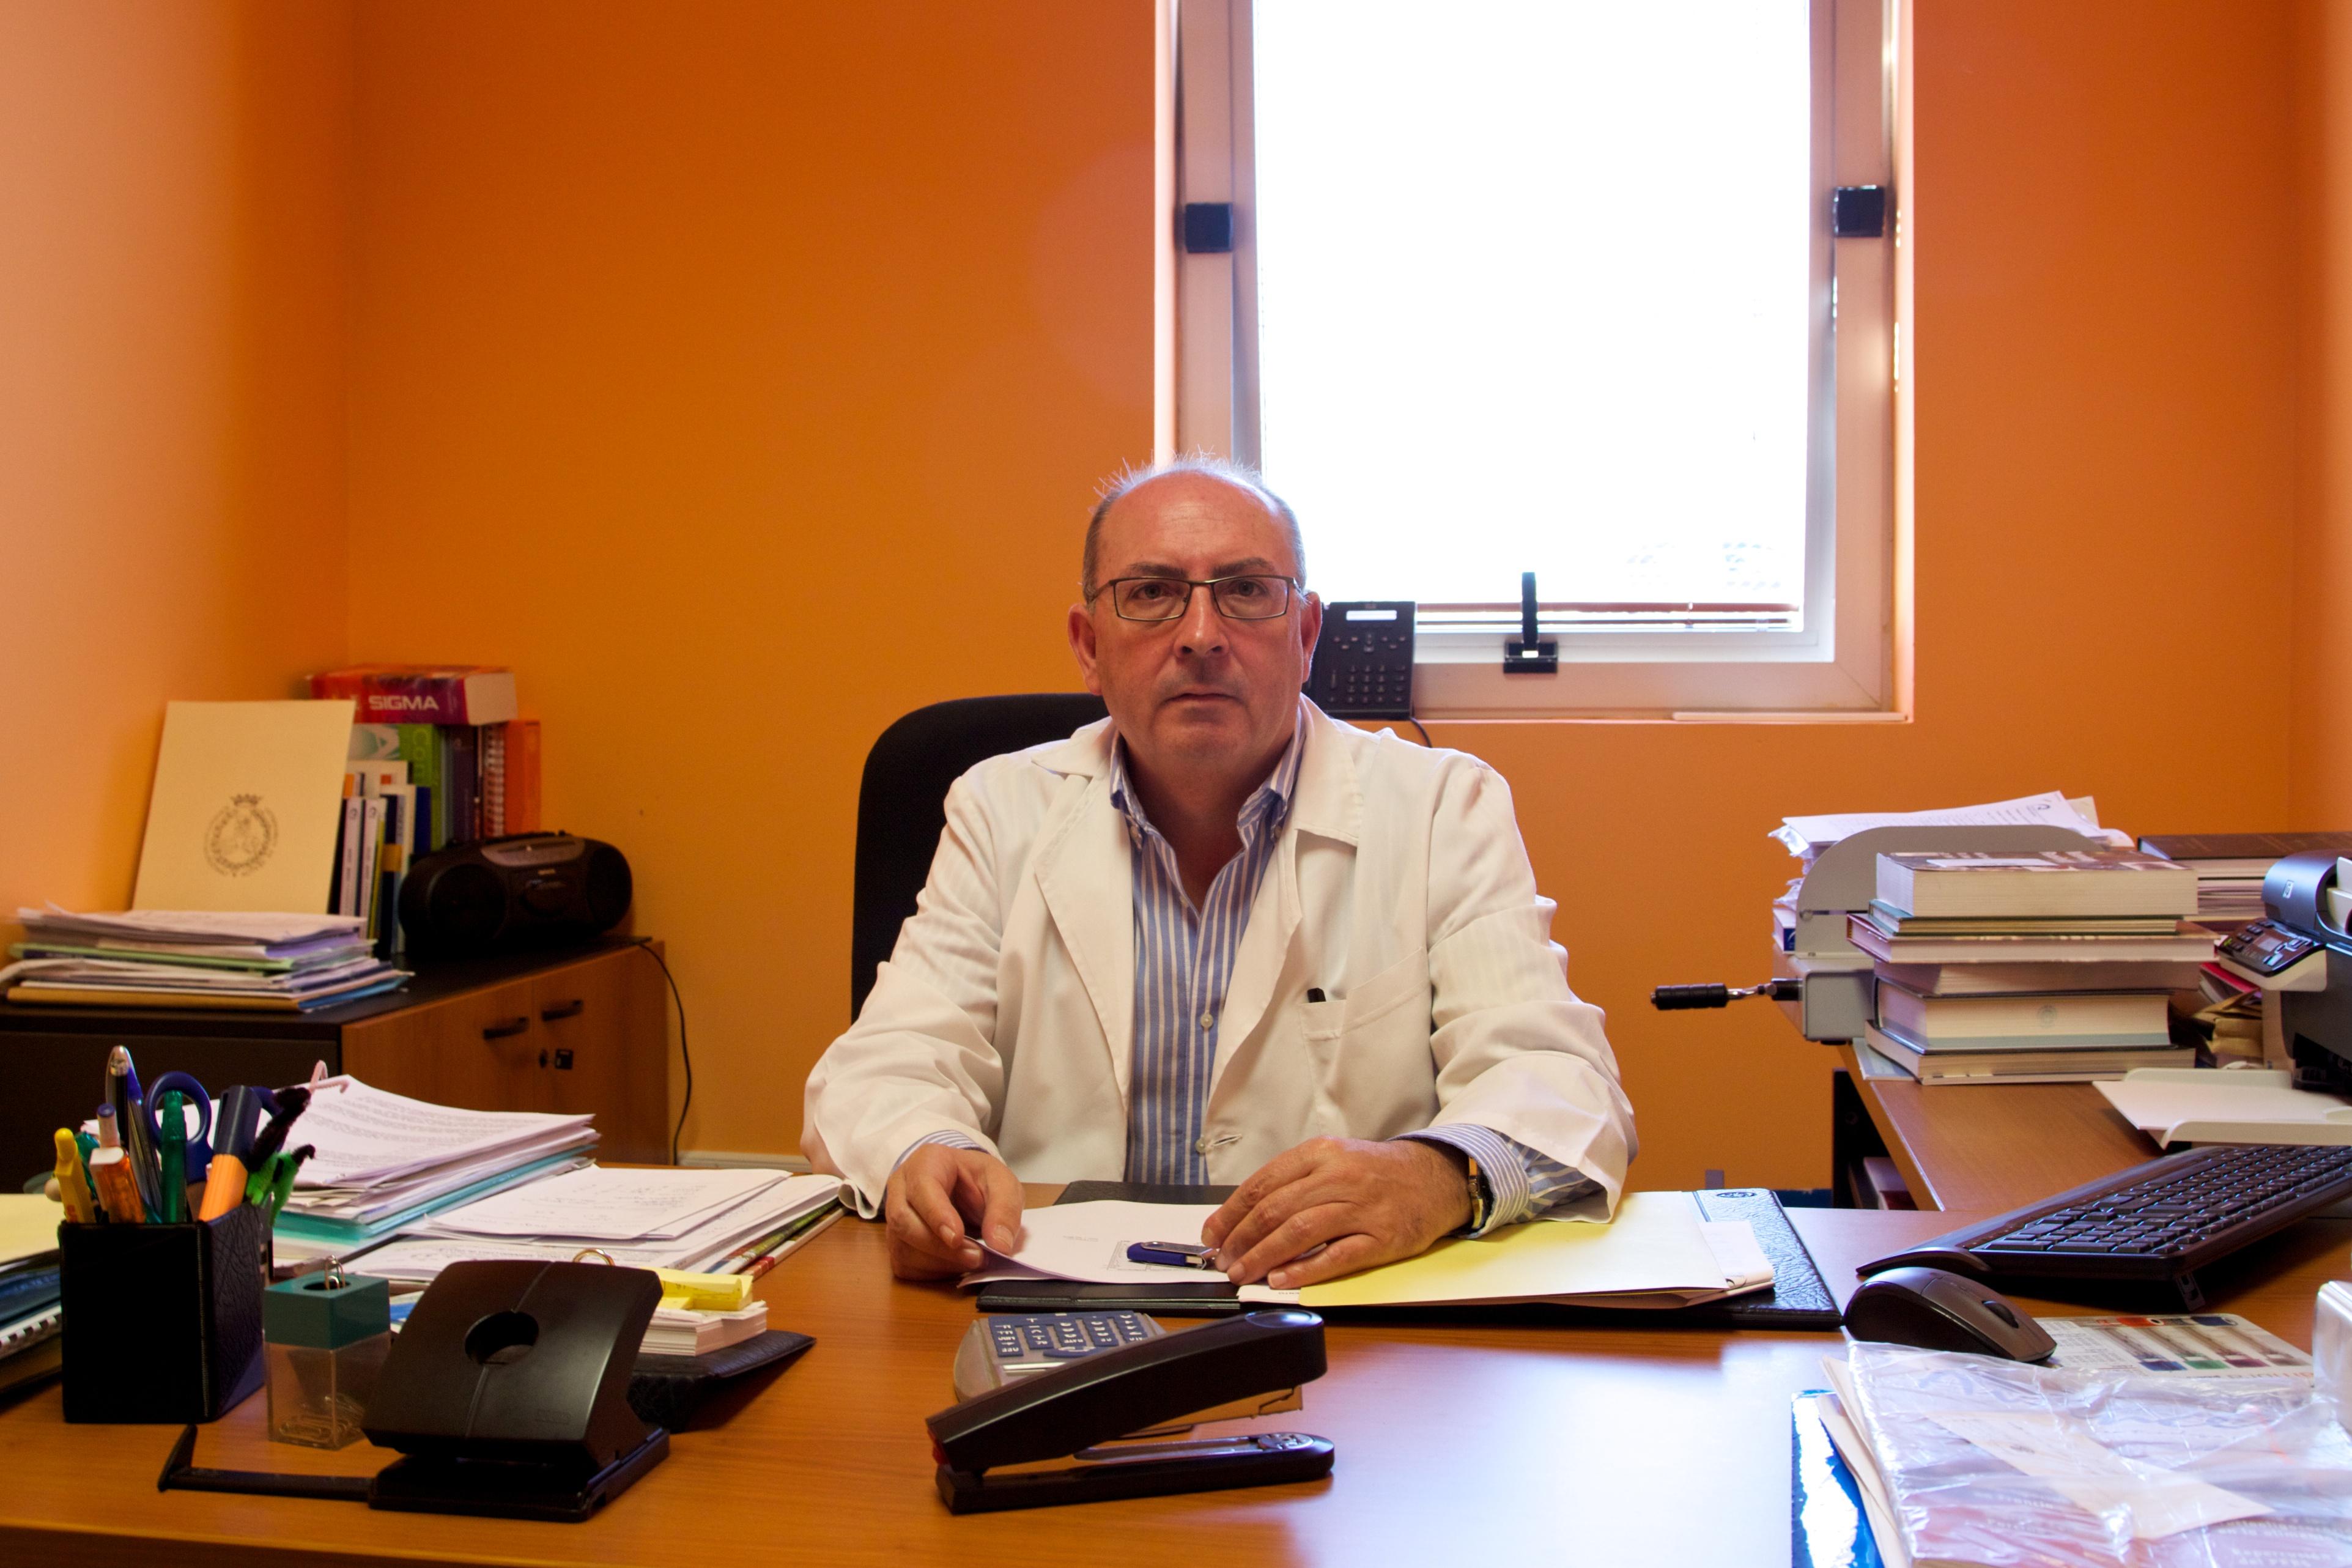 JOSÉ M. MOLINA CABALLERO, CATEDRÁTICO DE VETERINARIA